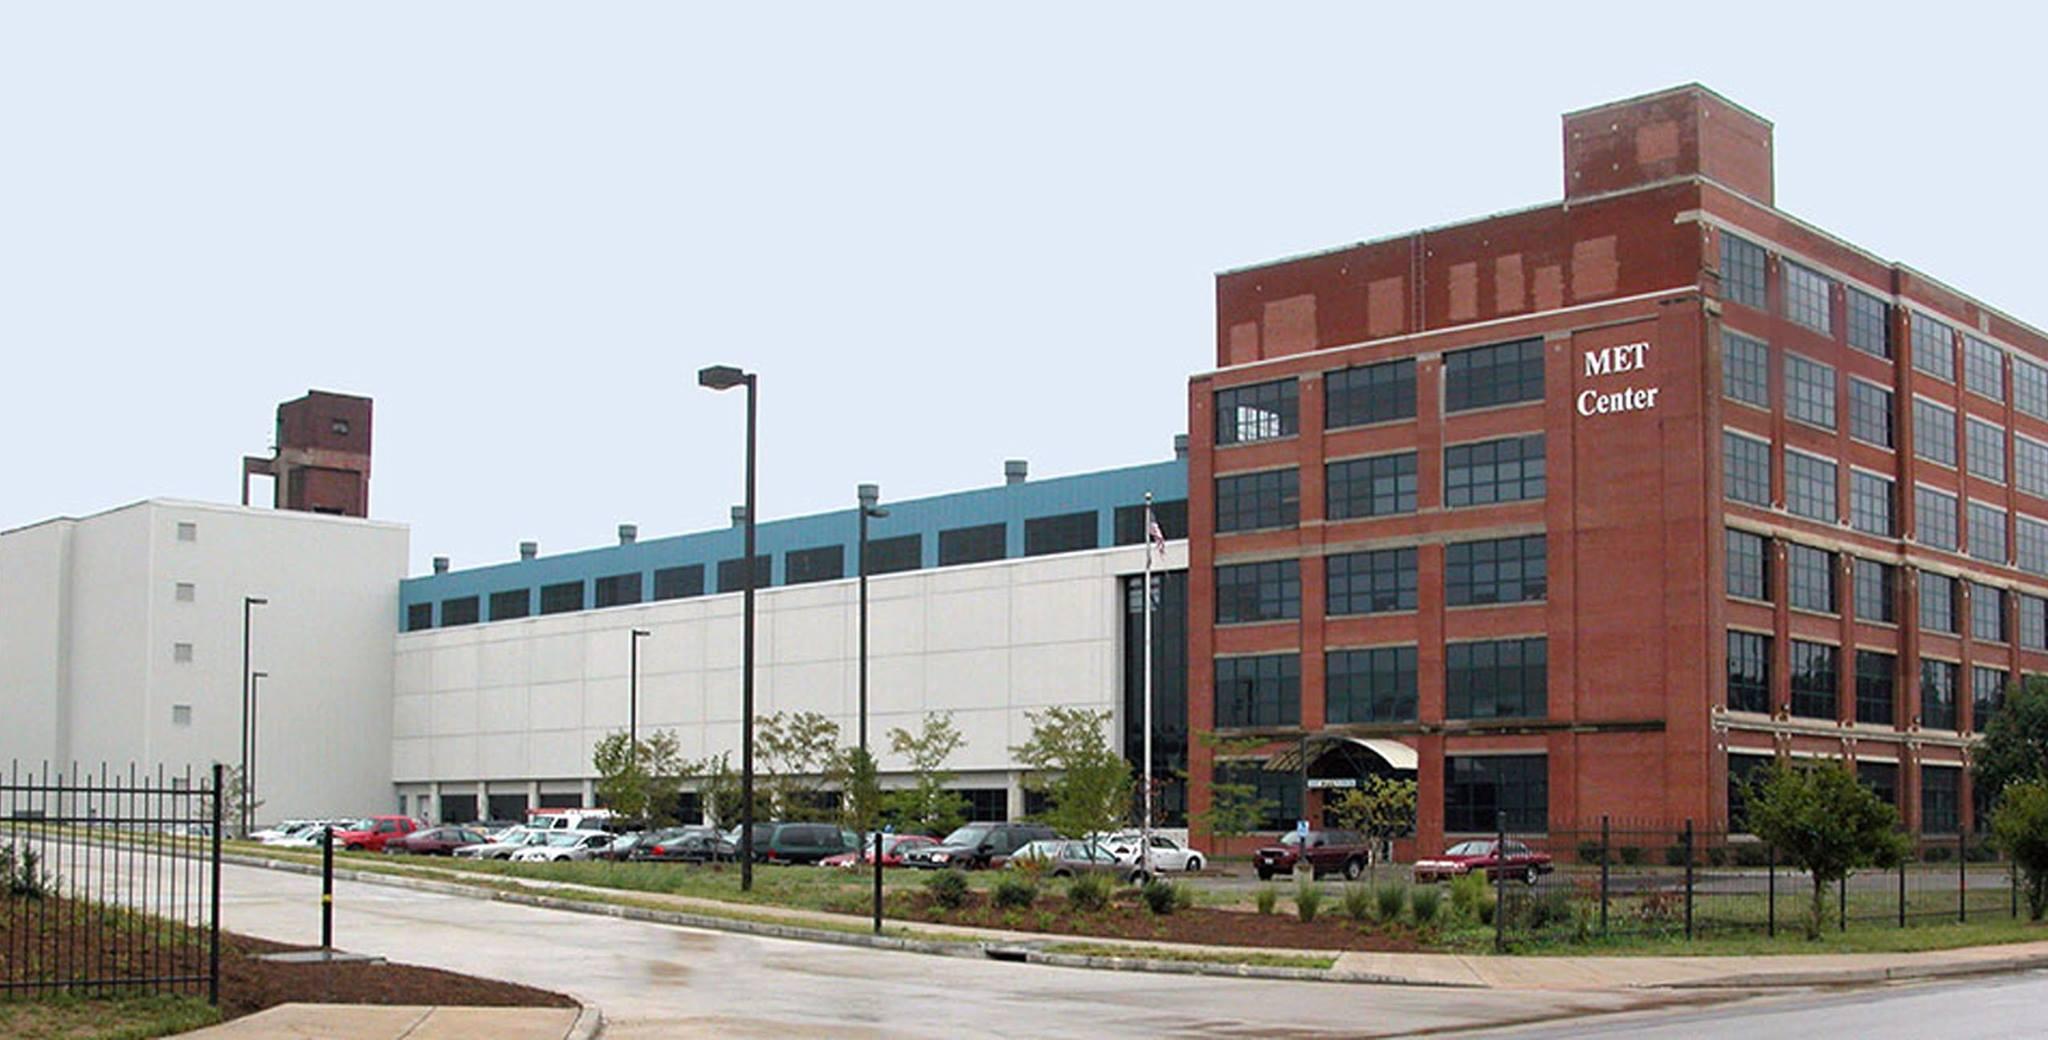 MET Center Resource Center